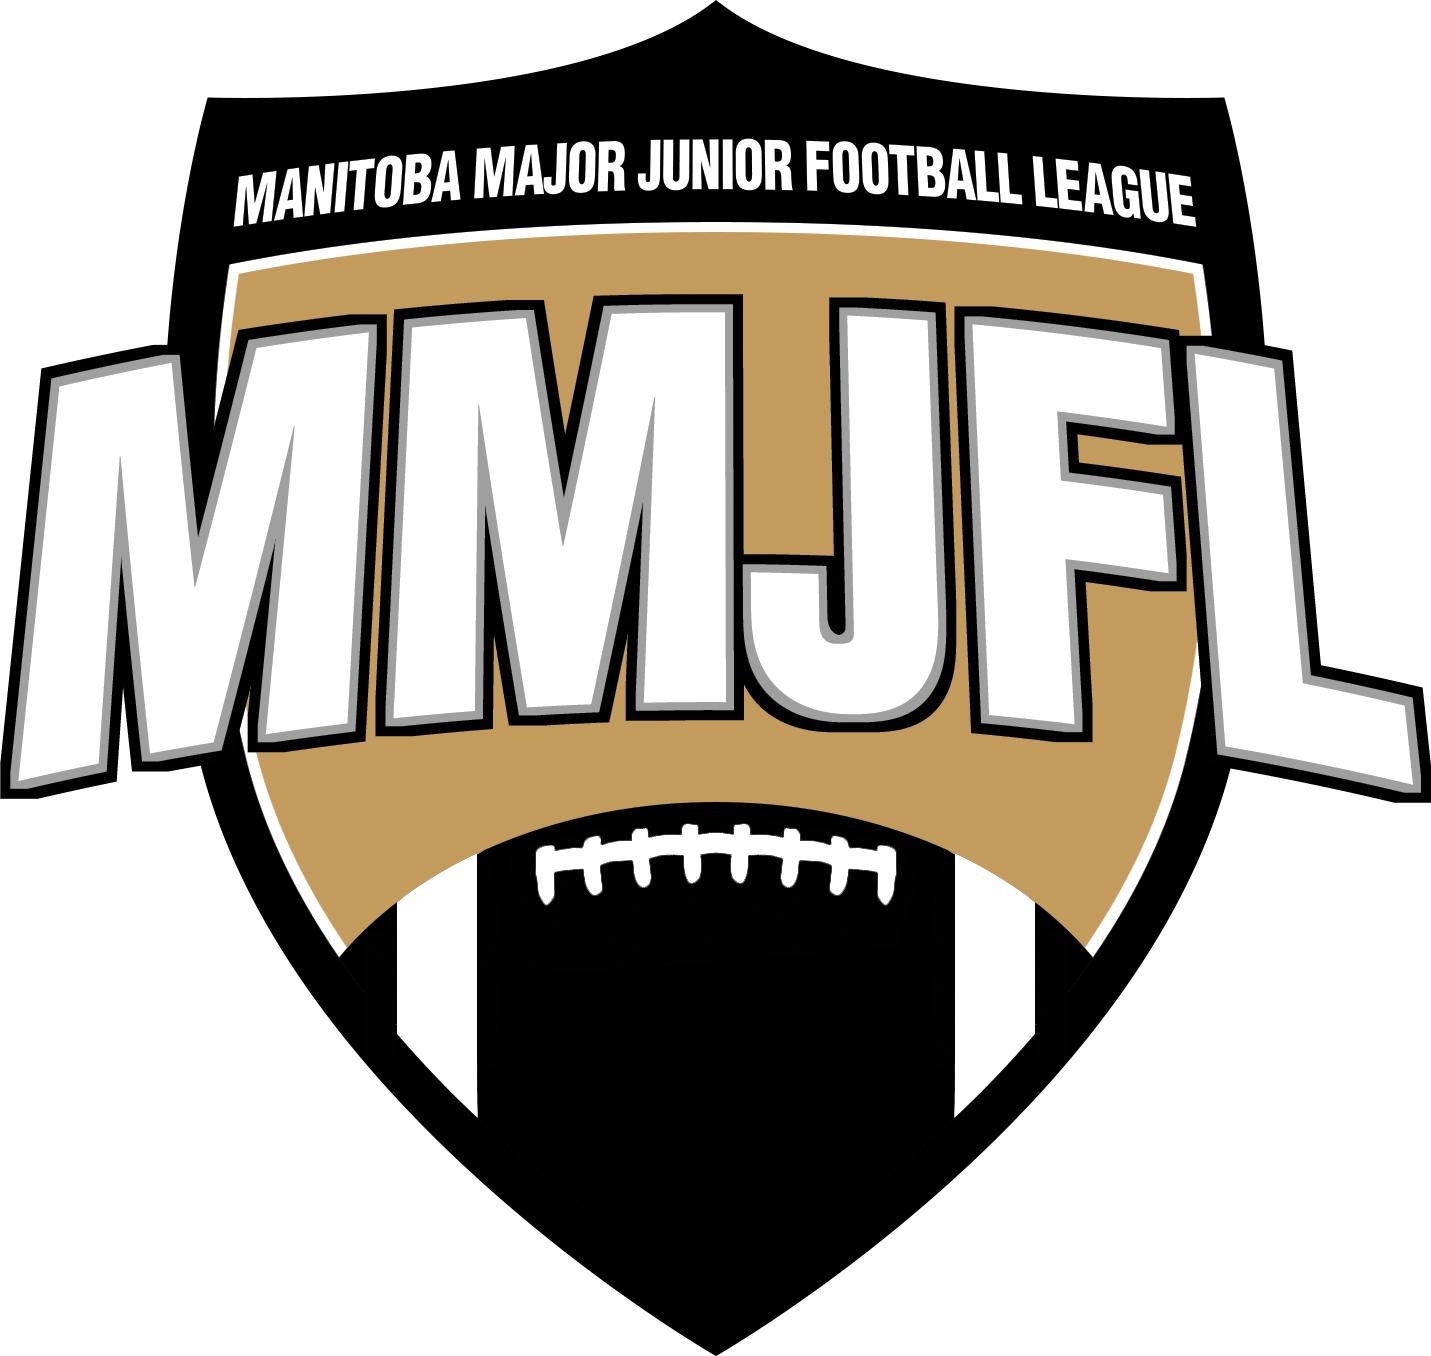 Manitoba Major Junior Football League